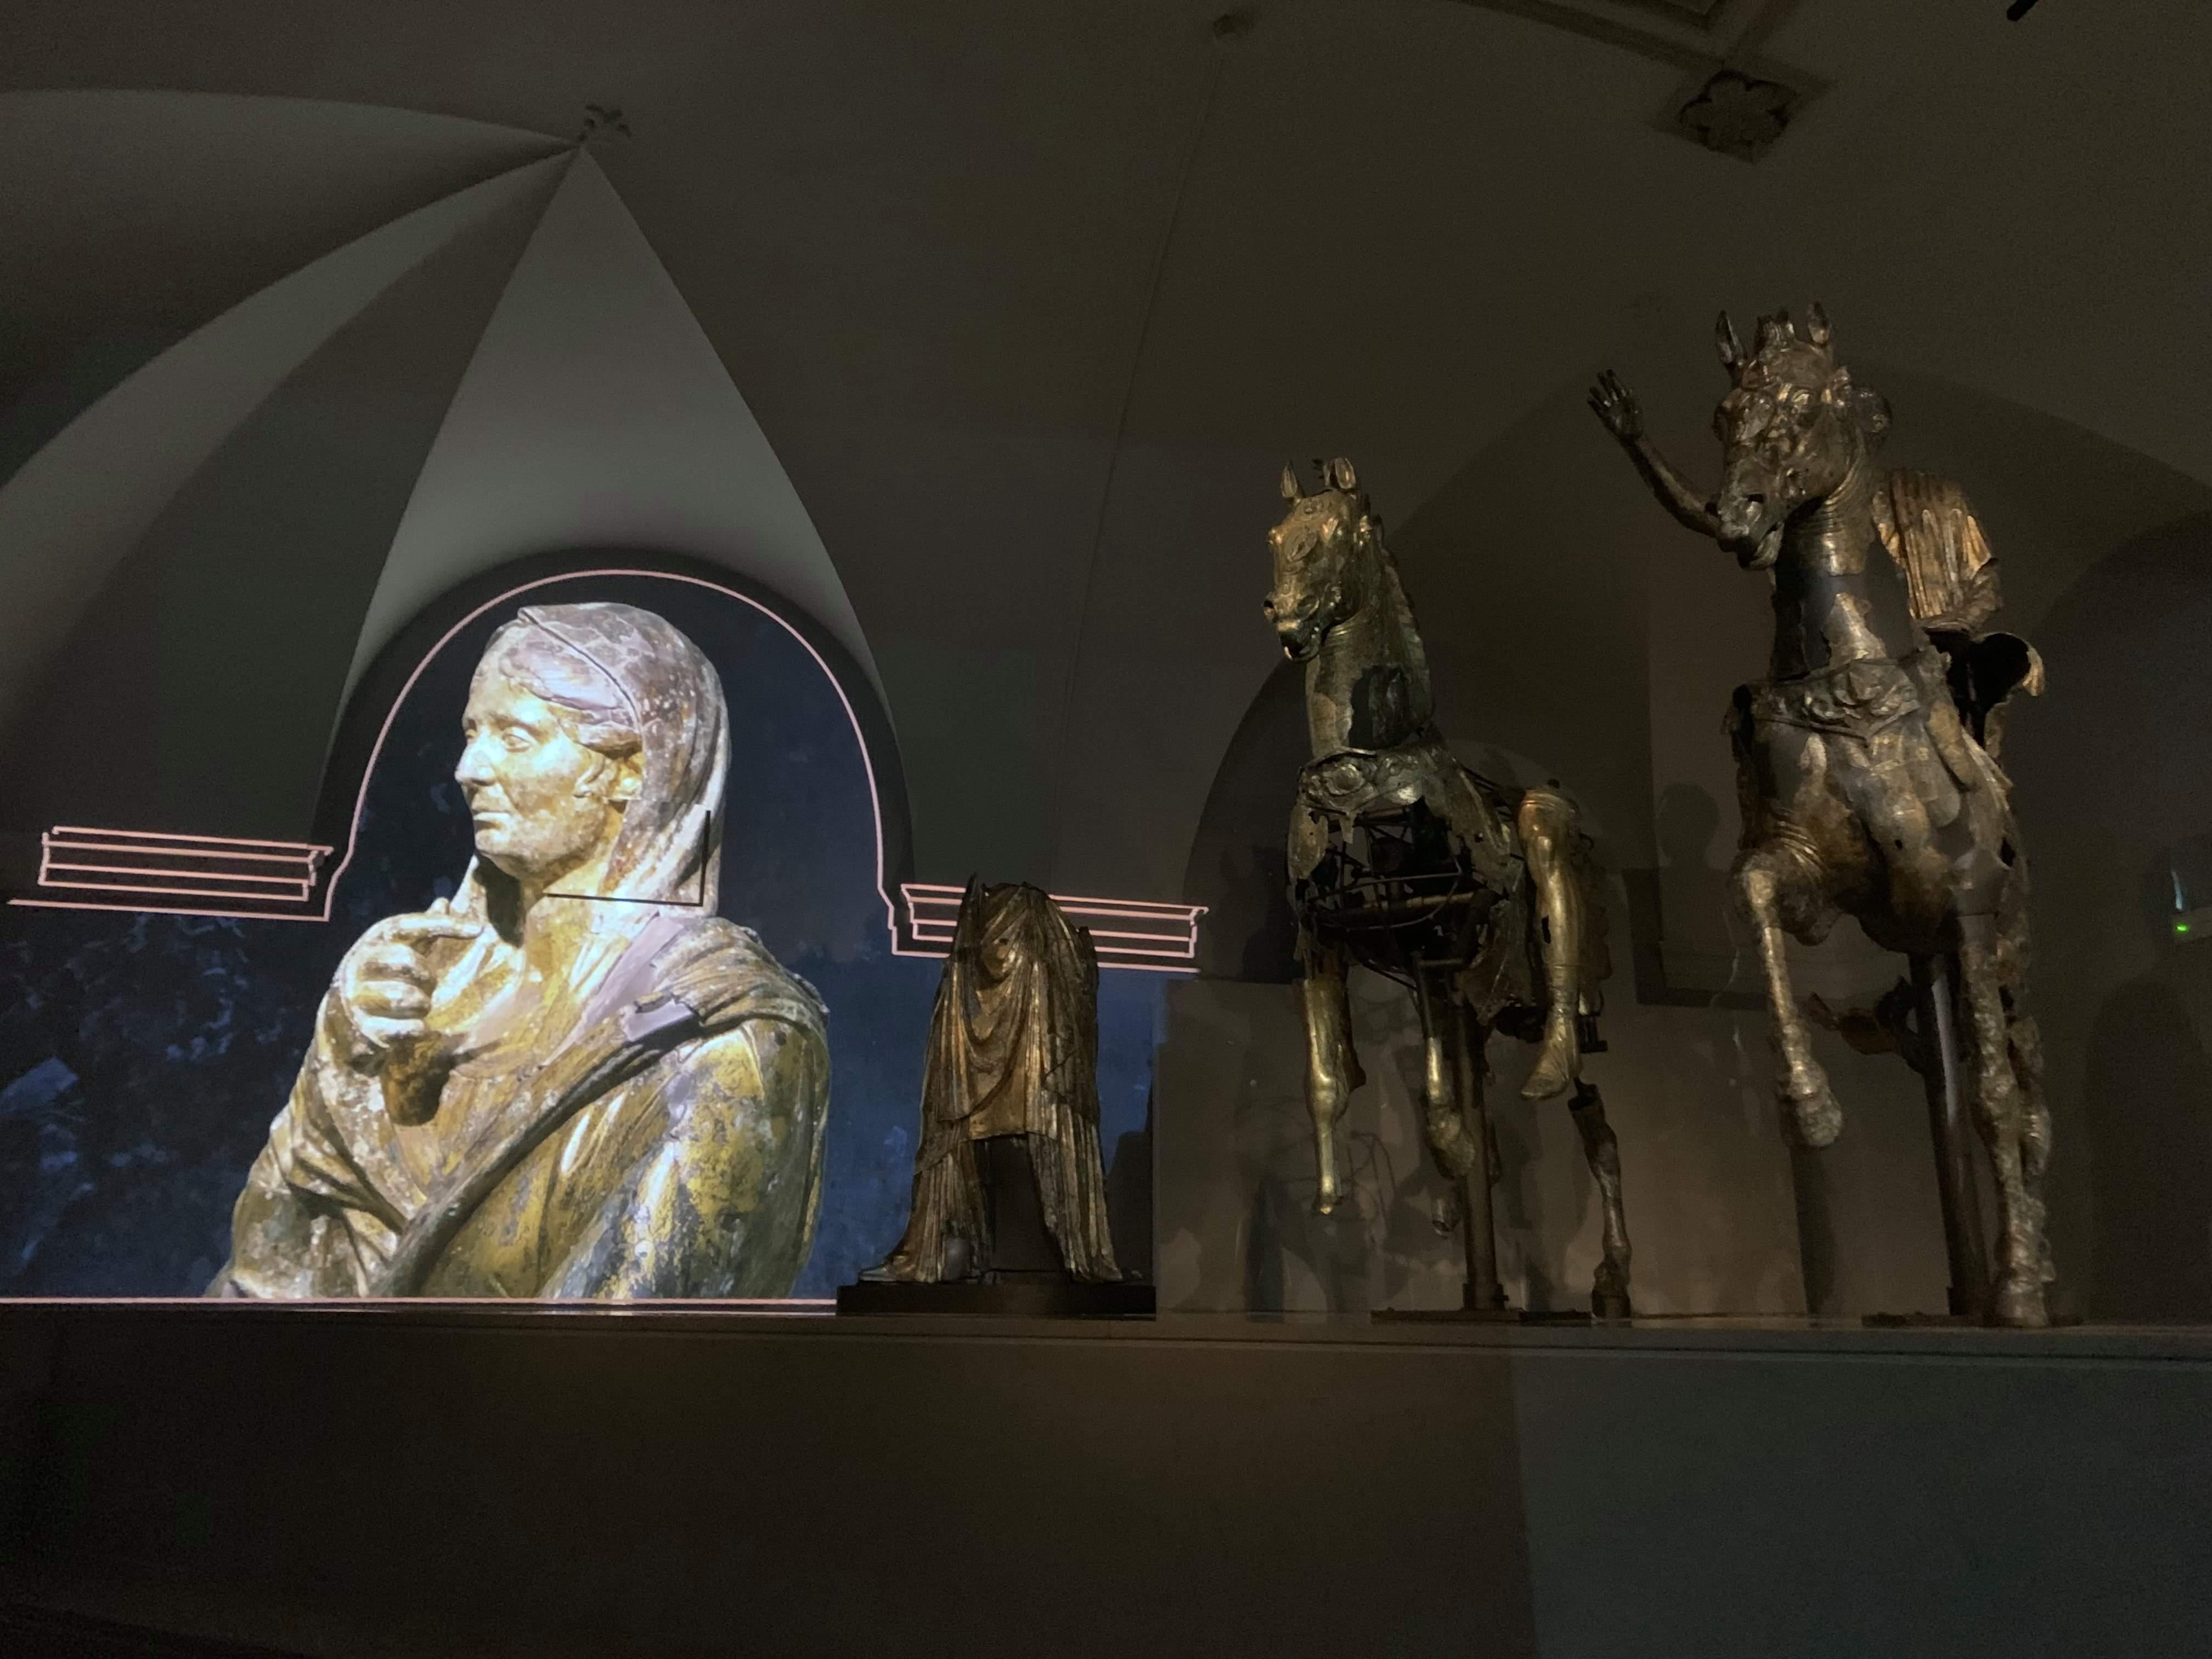 bronzi dorati pergola-sala immersiva